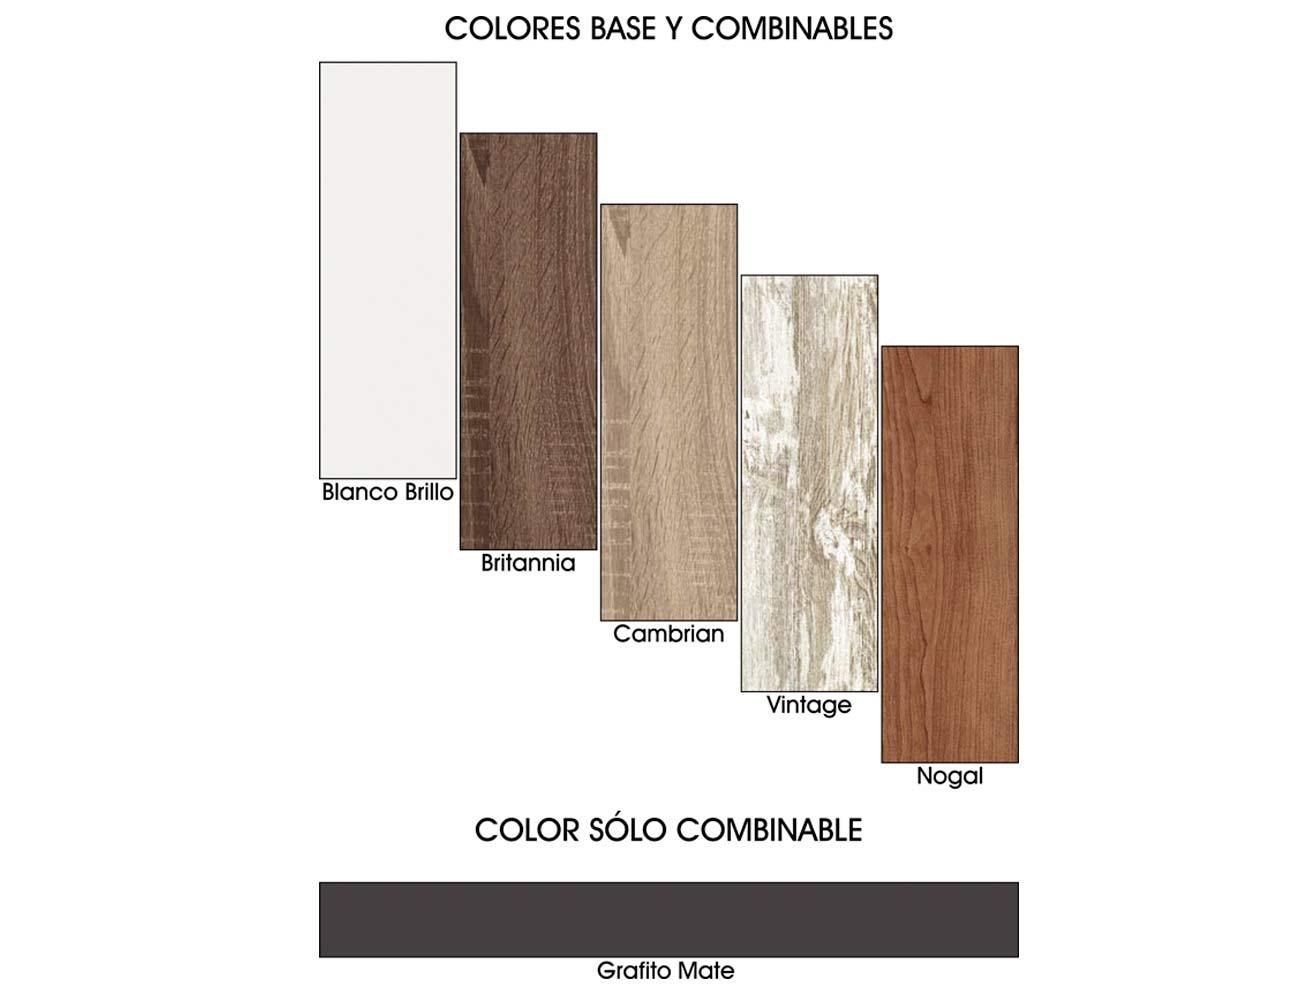 Colores7